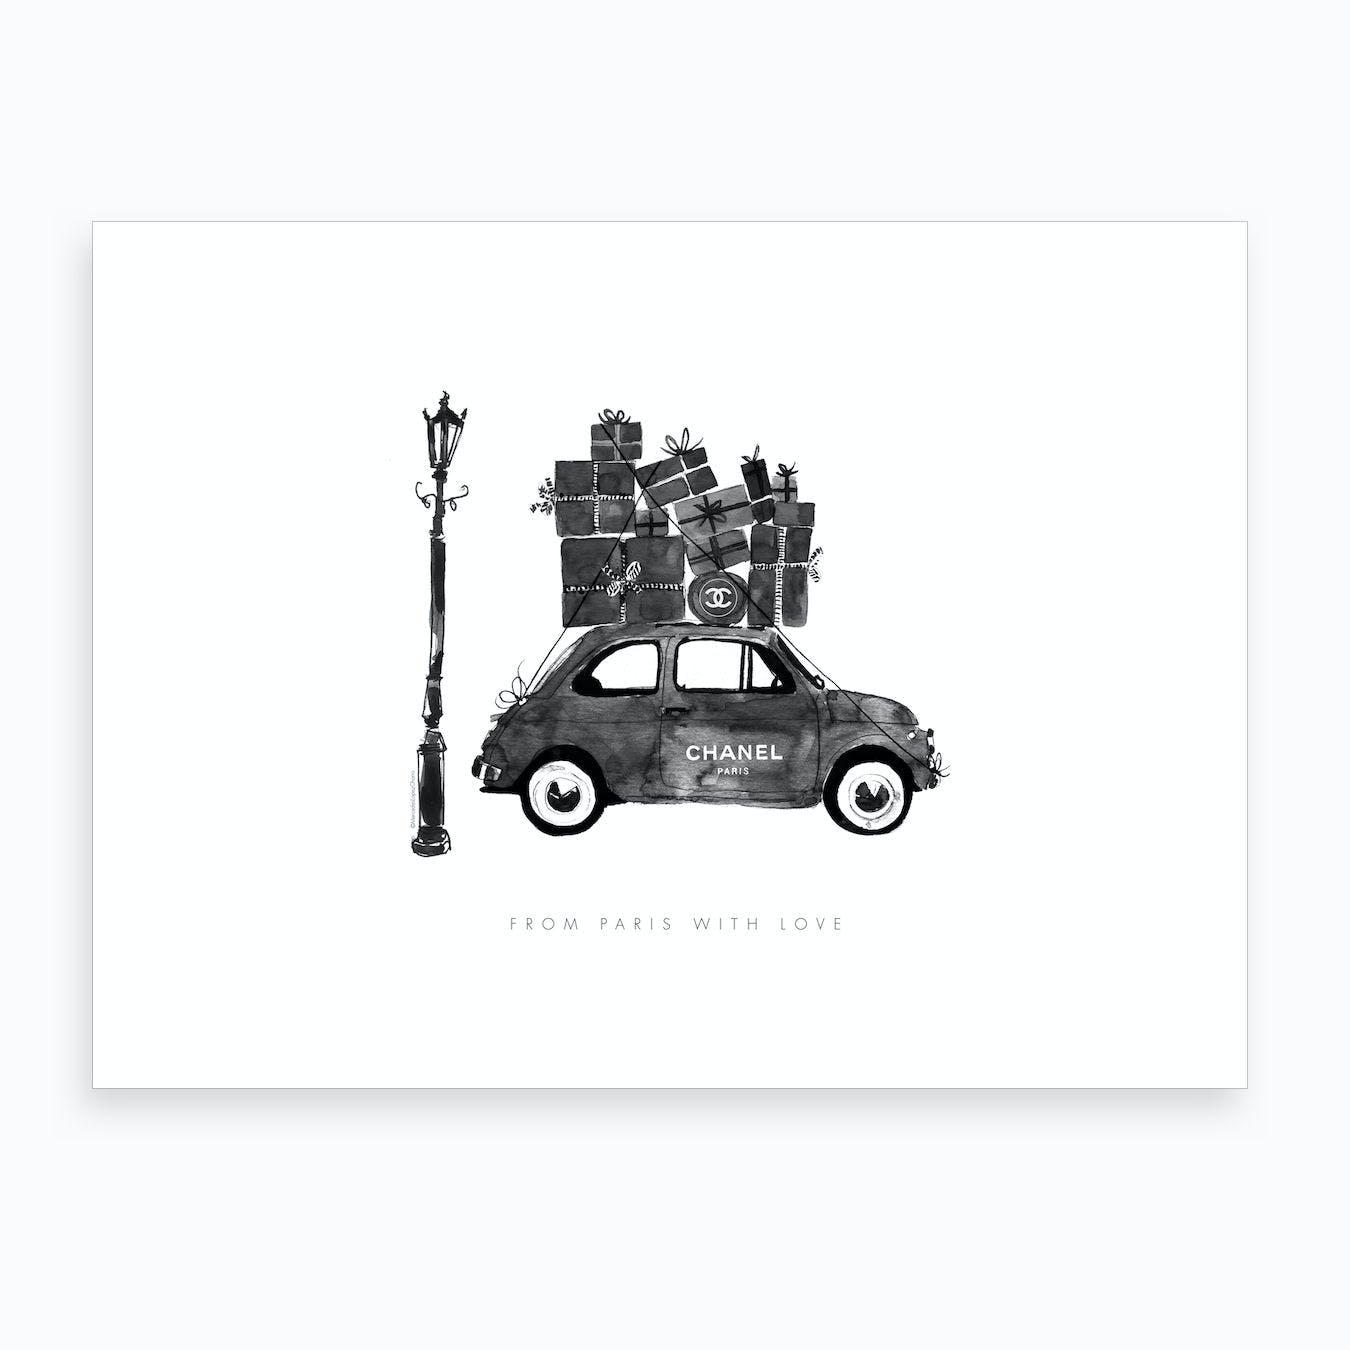 Chanel Vintage Car Art Print